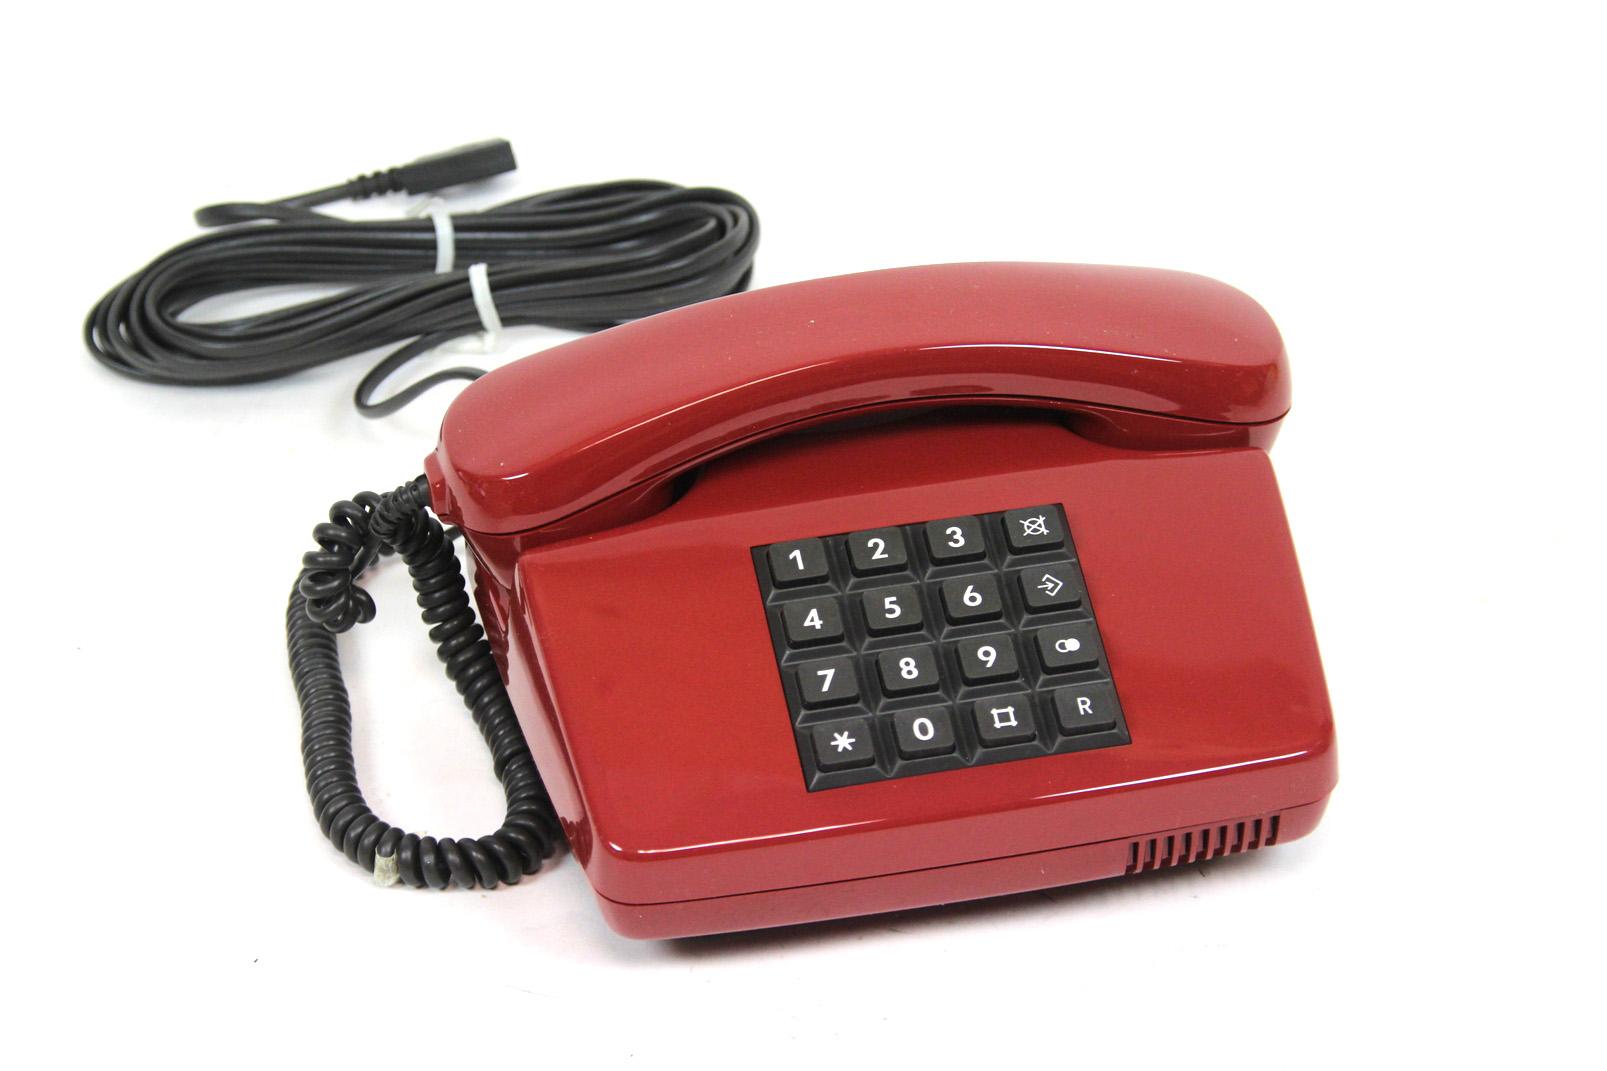 deutsche bundespost telekom telefon 01 lx tastentelefon. Black Bedroom Furniture Sets. Home Design Ideas